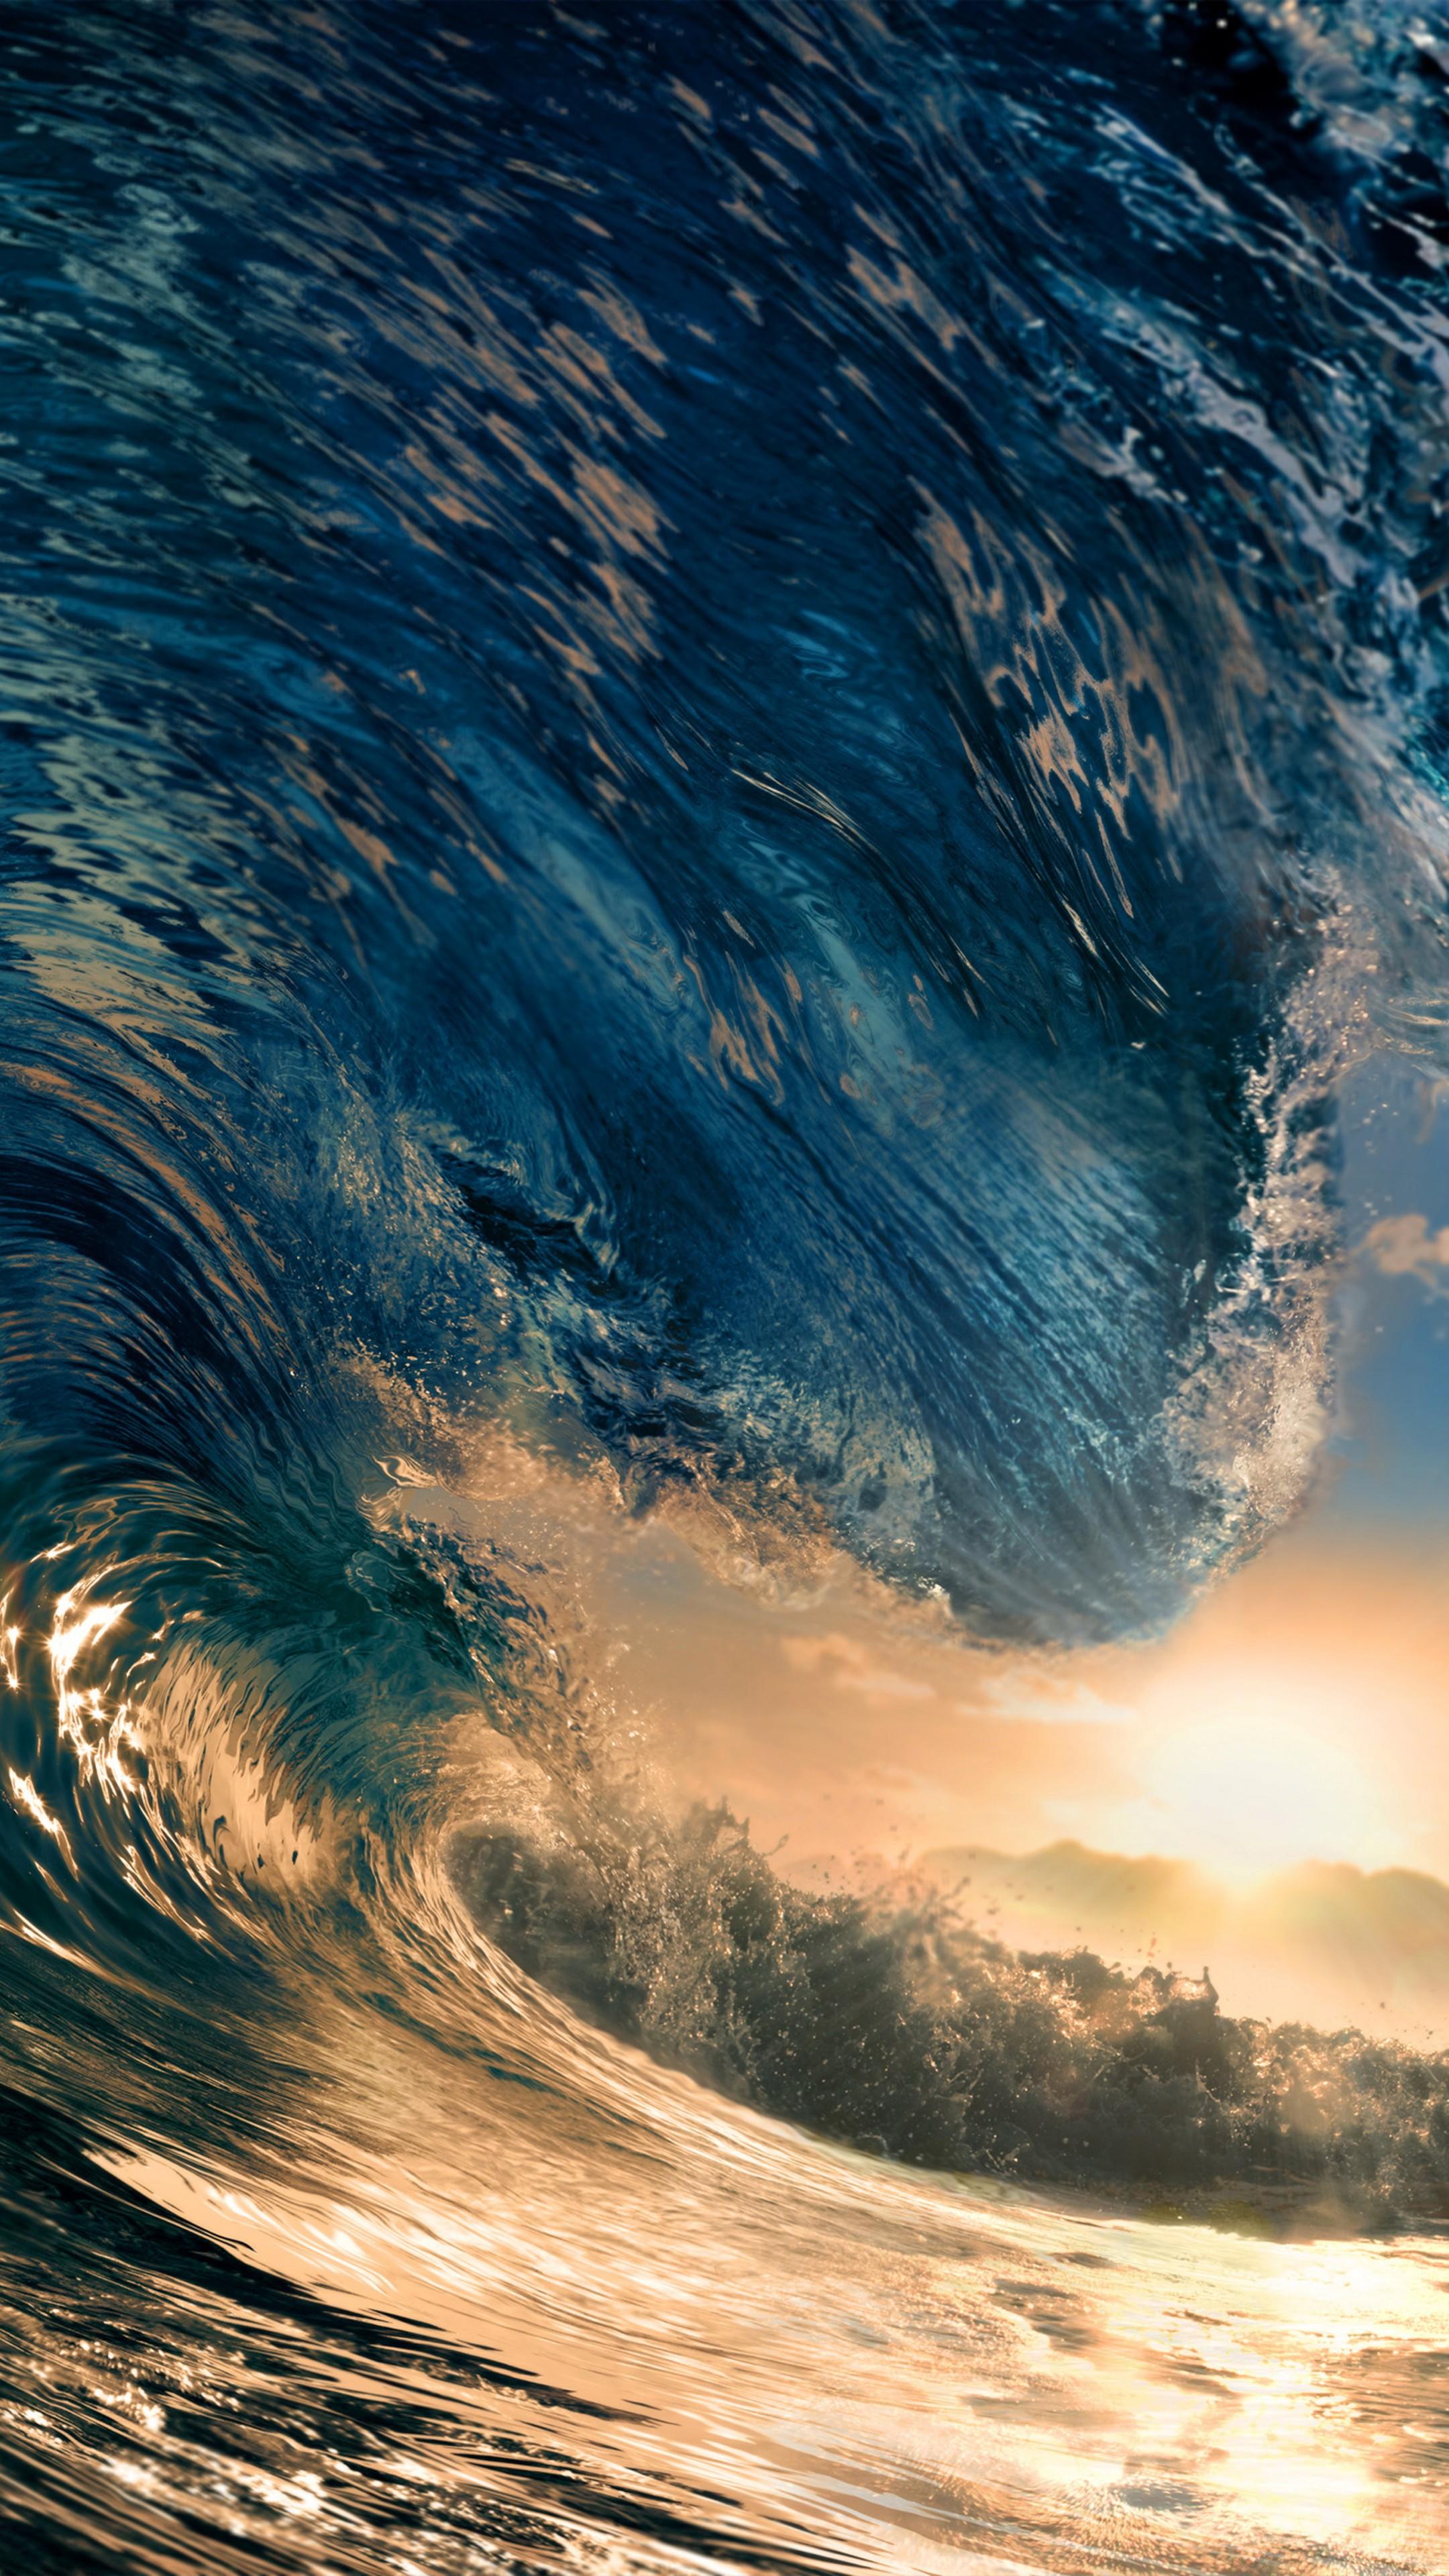 Wallpaper Sea, 5k, 4k wallpaper, ocean, water, wave, sunset, sky, rays, sun, blue, Nature 402